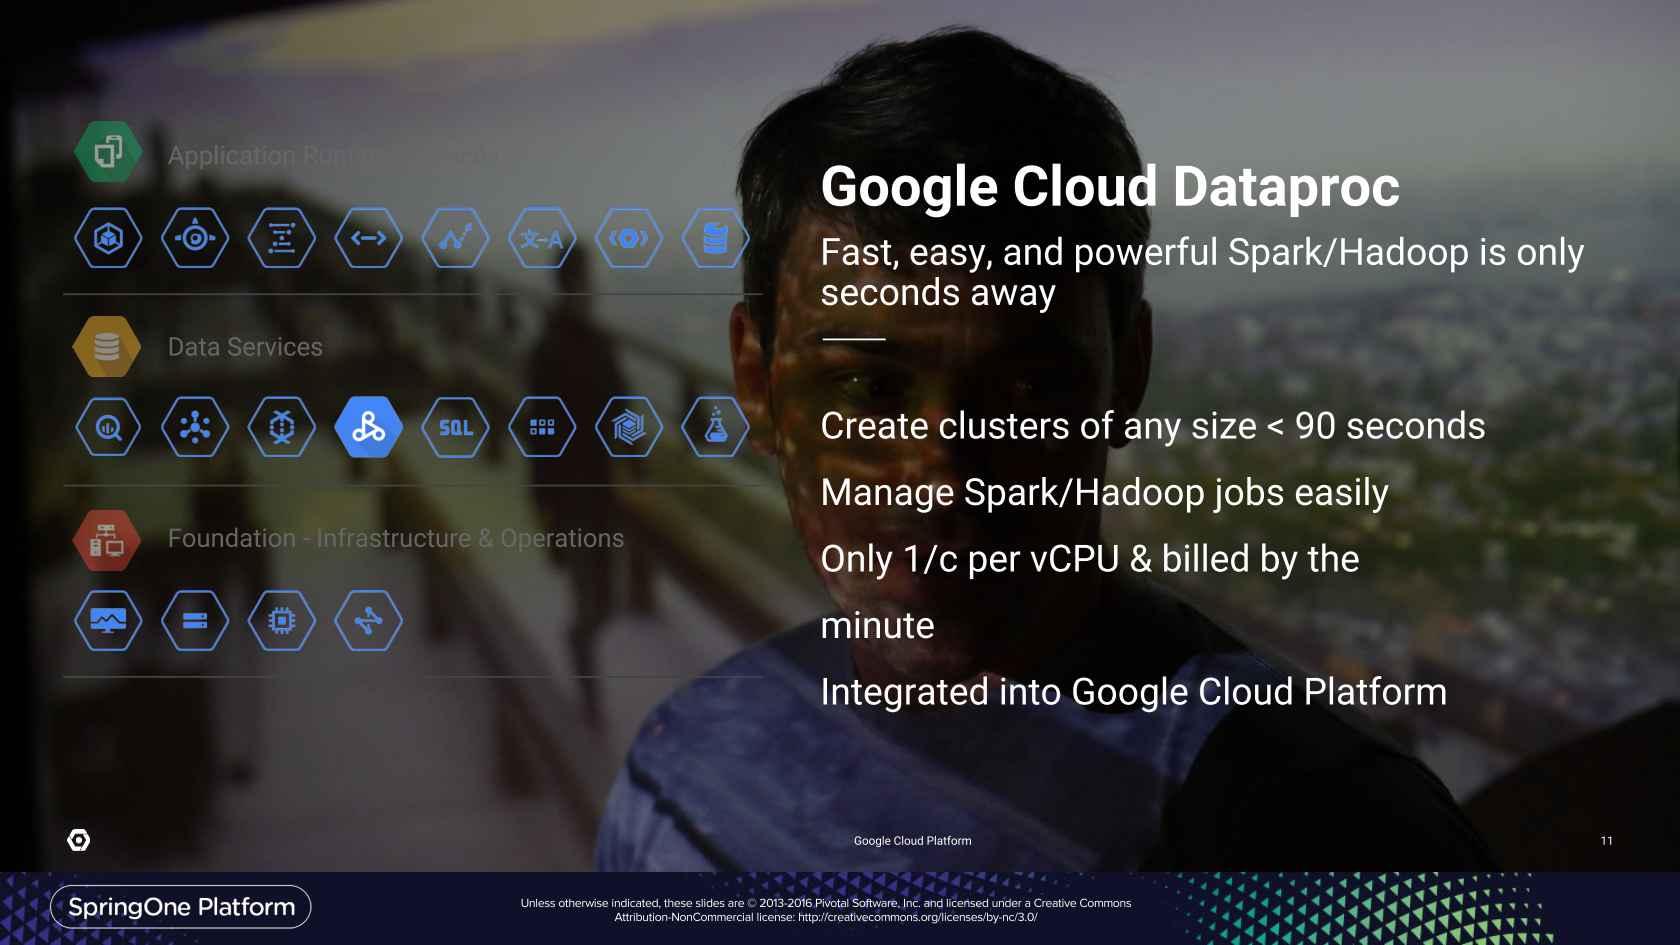 Google Cloud Platform for the Enterprise